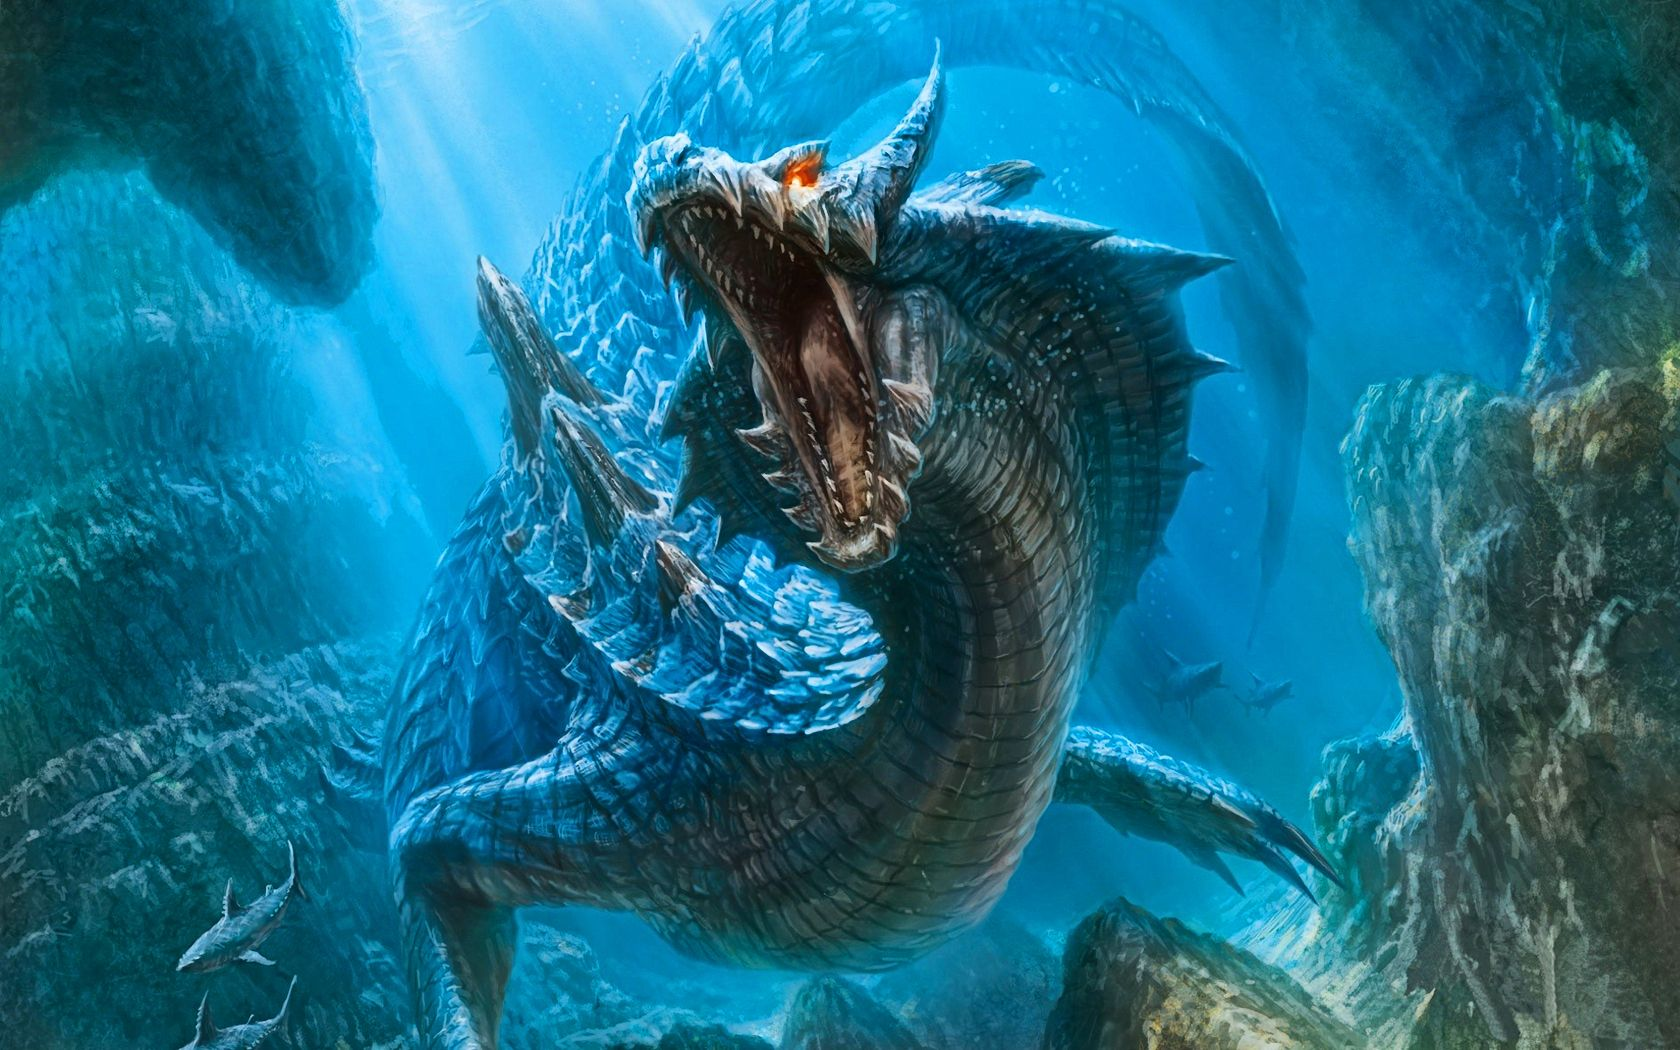 Beautiful Water Dragon Wallpapers Top Free Beautiful Water